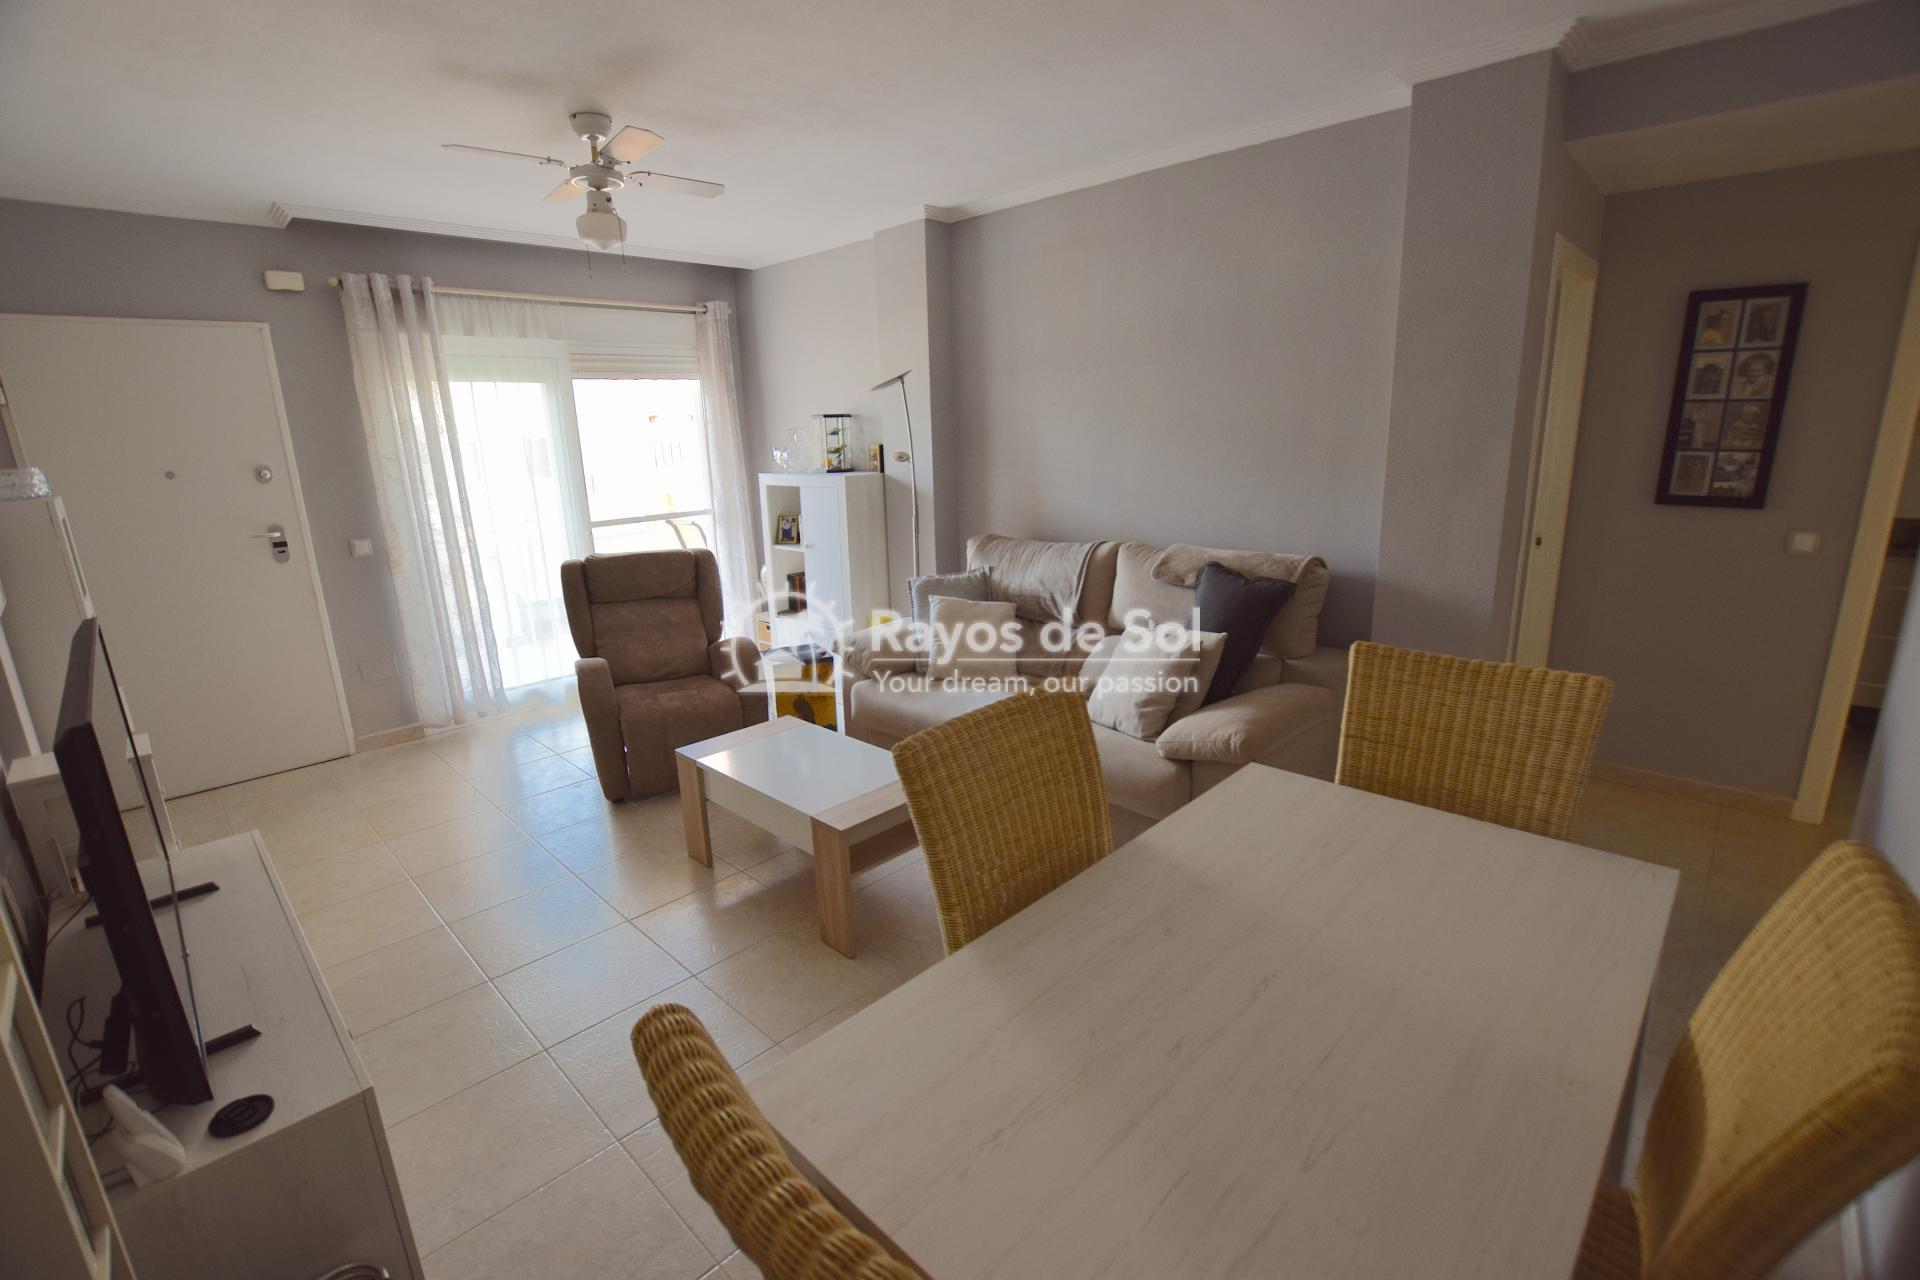 Appartement met zuidwest oriëntatie  in San Cayetano, Costa Cálida (SCRE0055) - 3